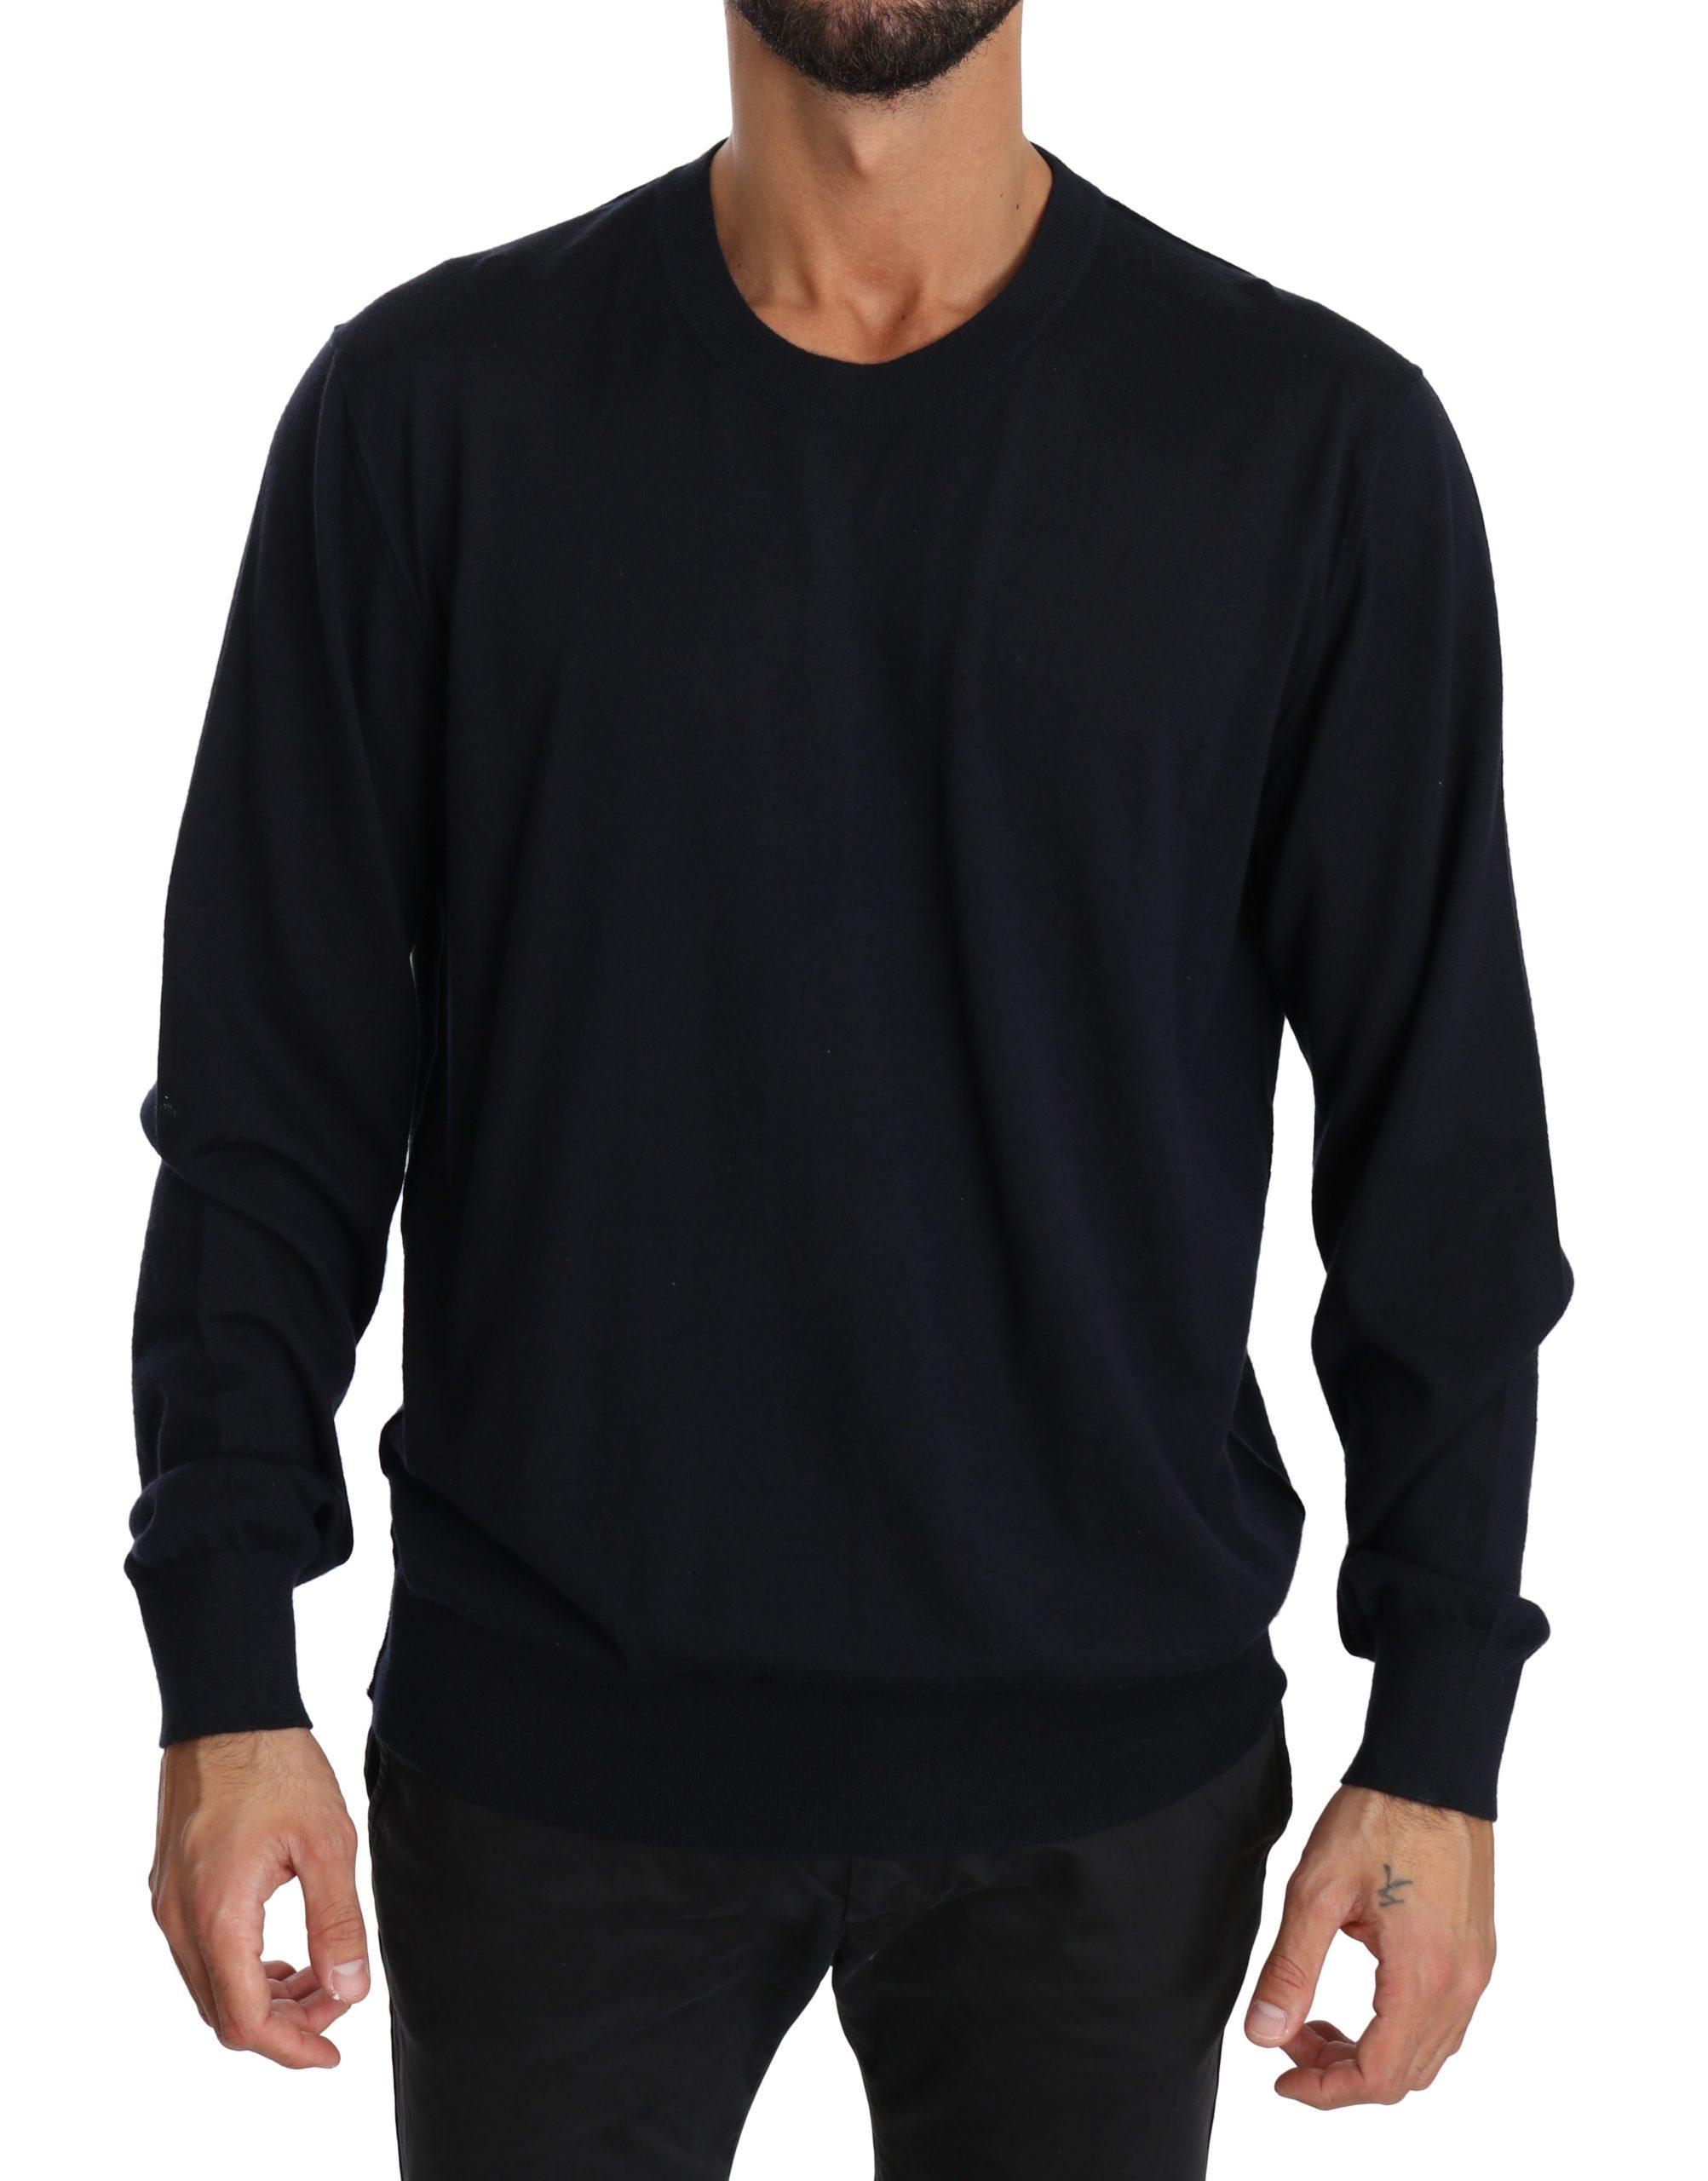 Dolce & Gabbana Men's Cashmere Crewneck Pullover Sweater Blue TSH3940 - IT52 | XL